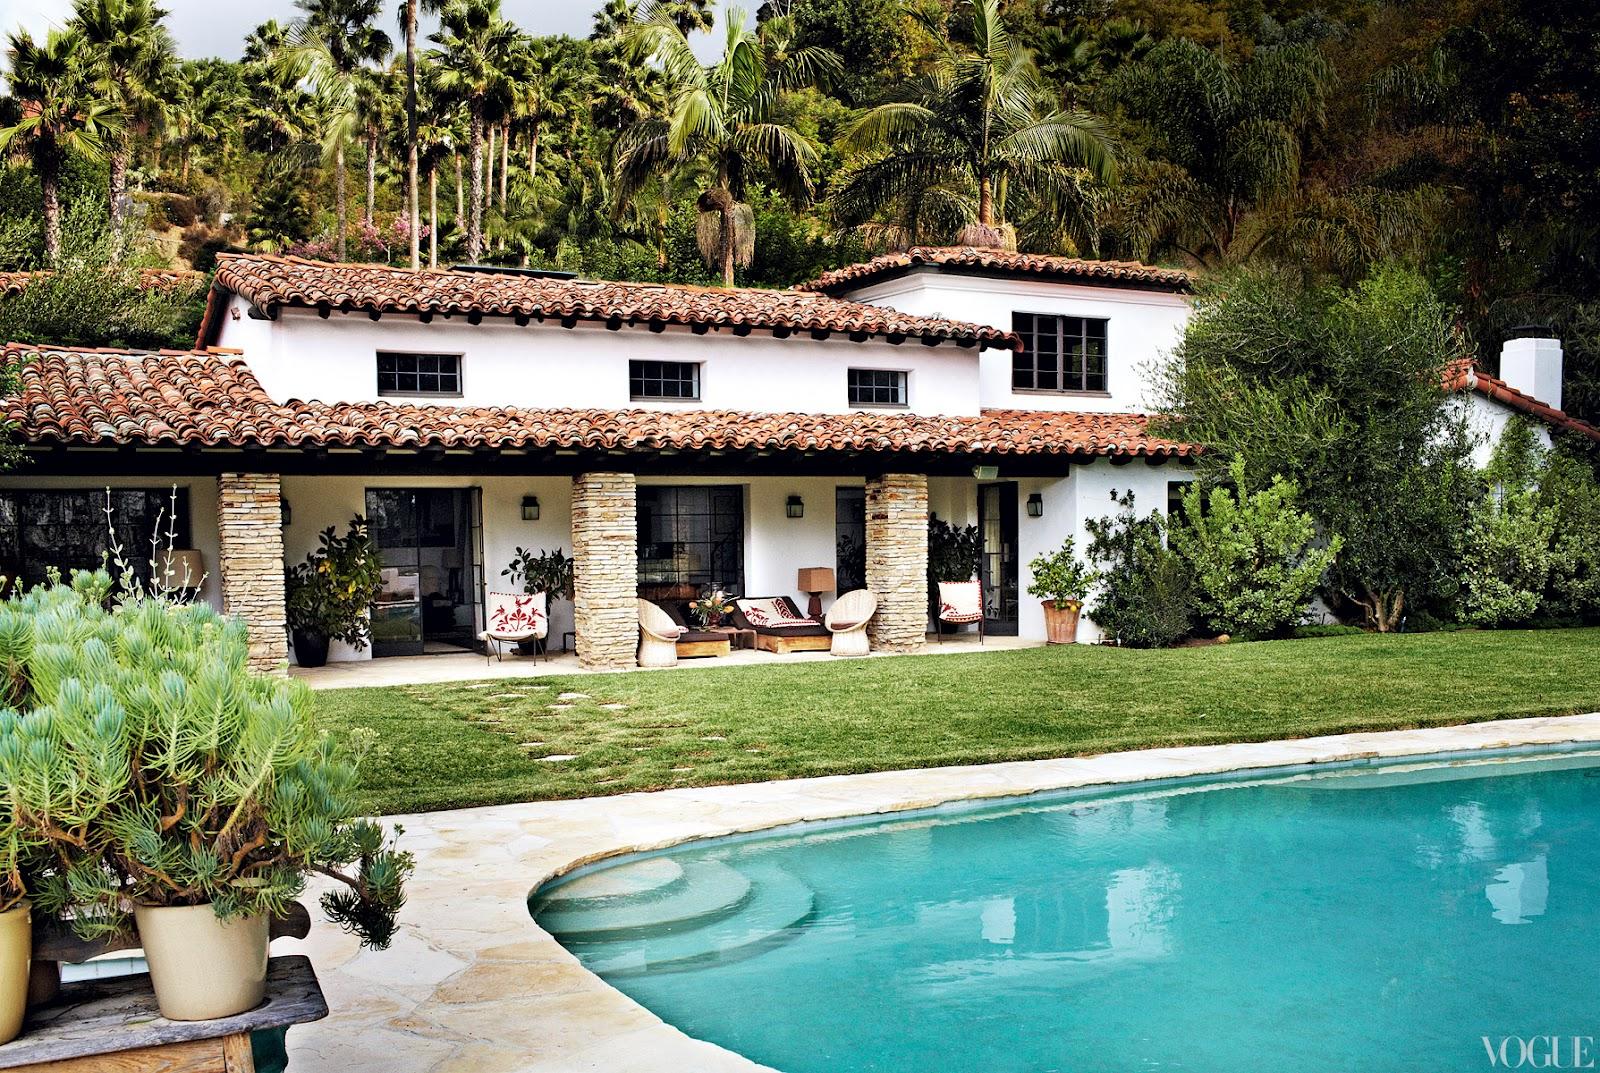 Hacienda homes 2015 home design ideas for Spanish hacienda style